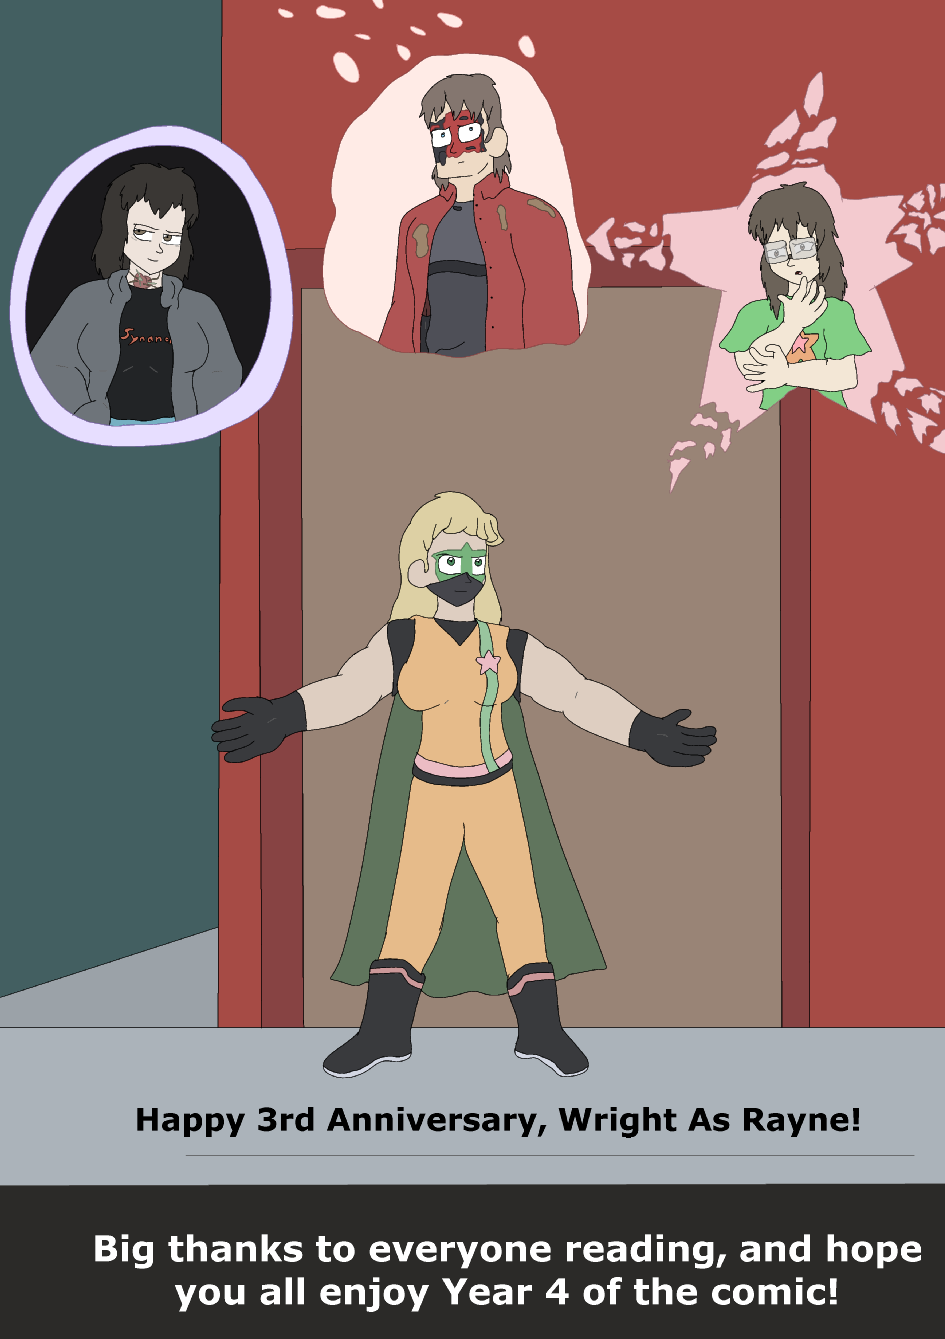 Wright as Rayne's Third Anniversary